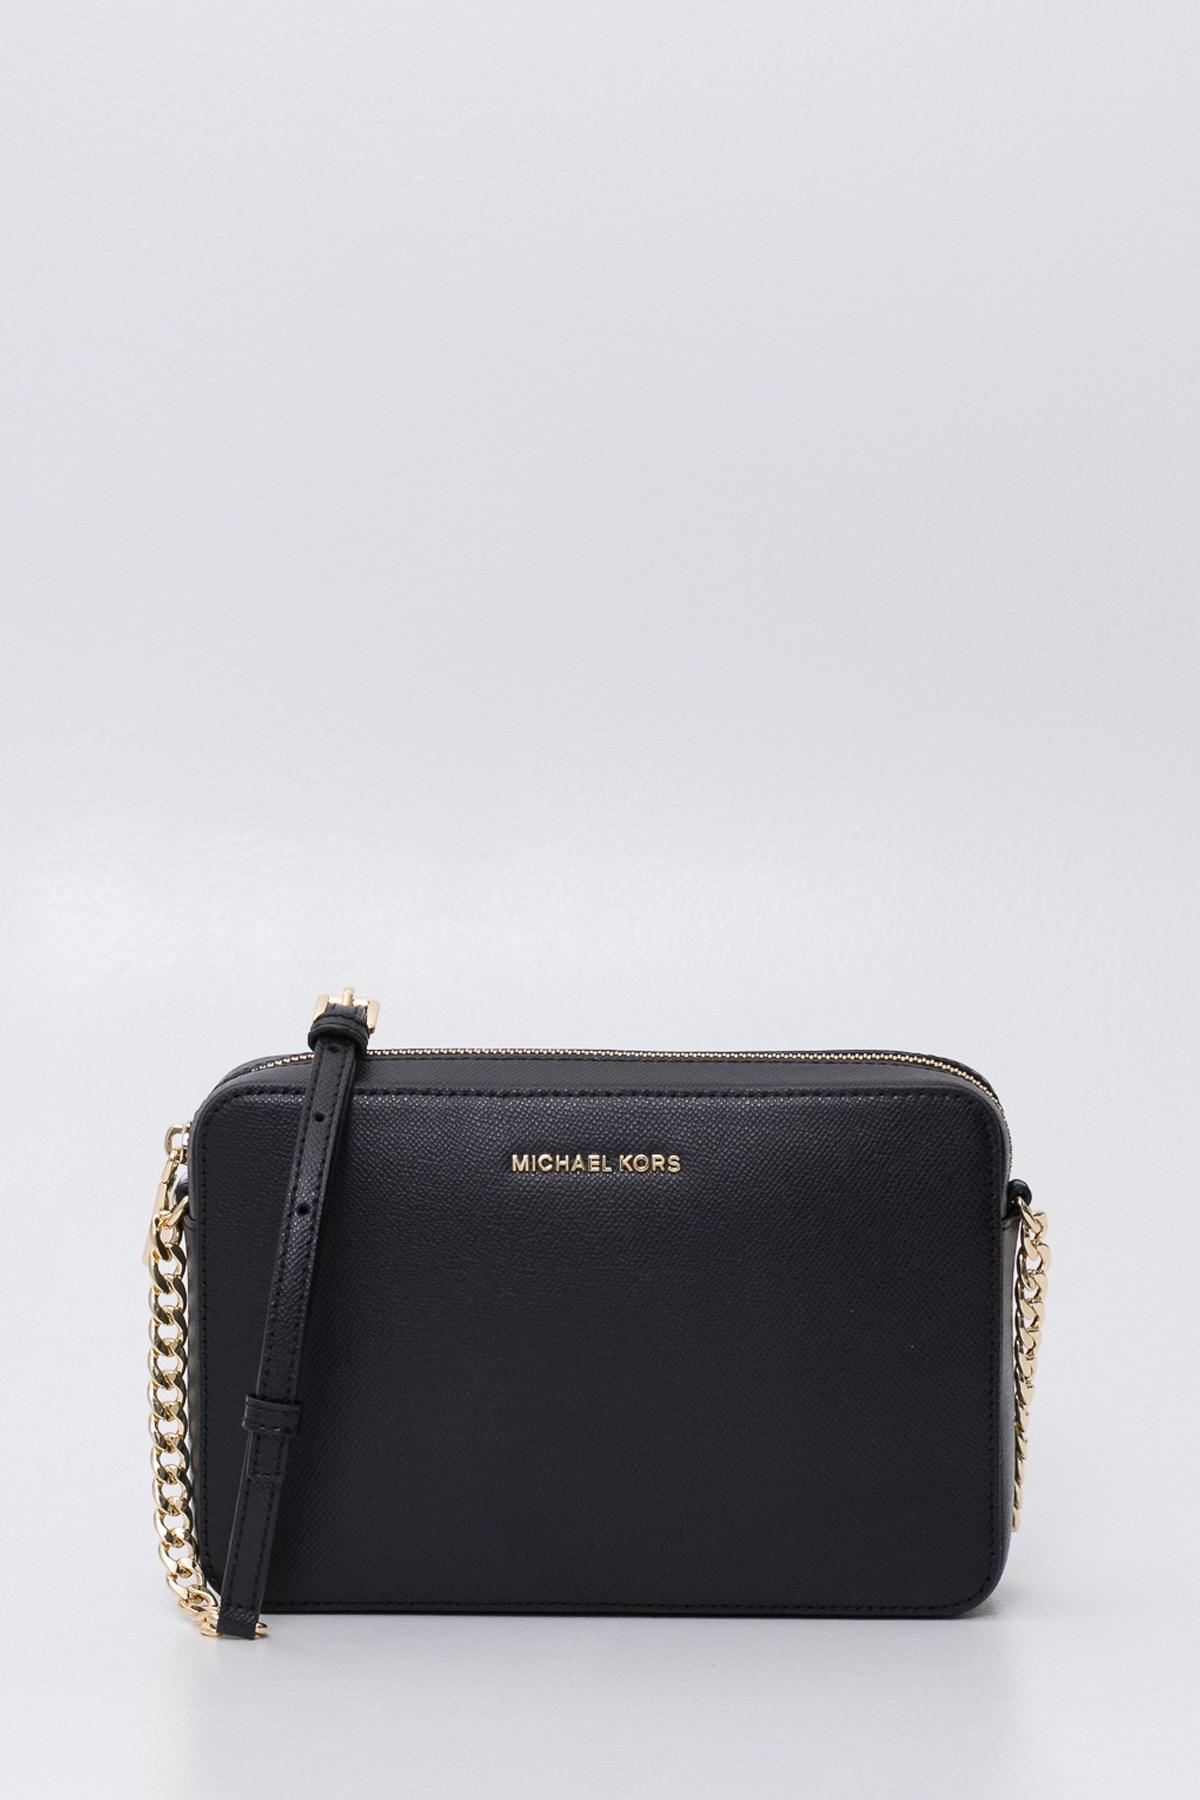 343c6d32a095 MICHAEL Michael Kors. Women s Black Jet Set Travel Saffiano Leather  Crossbody Bag